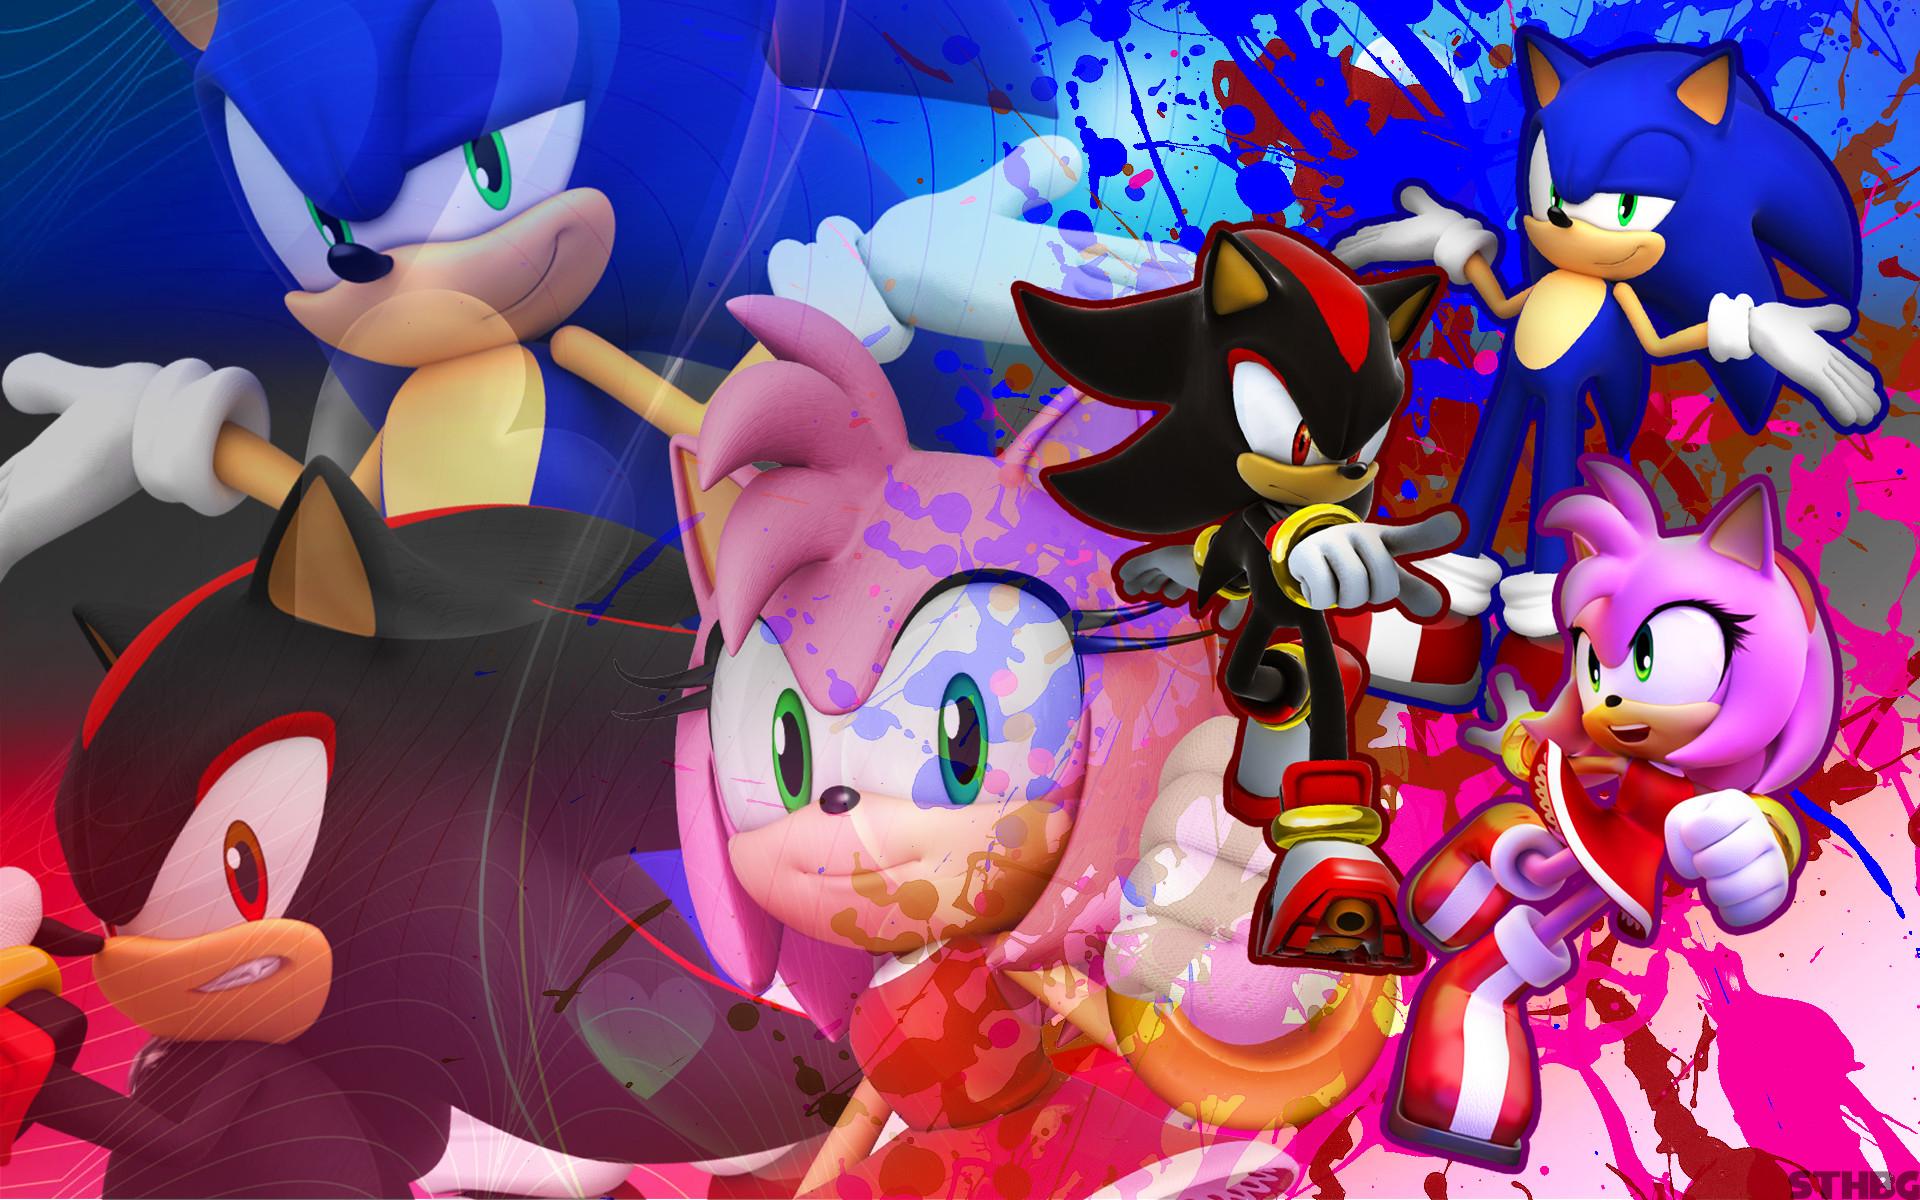 … SonicTheHedgehogBG Sonic, Shadow, And Amy – Wallpaper by  SonicTheHedgehogBG